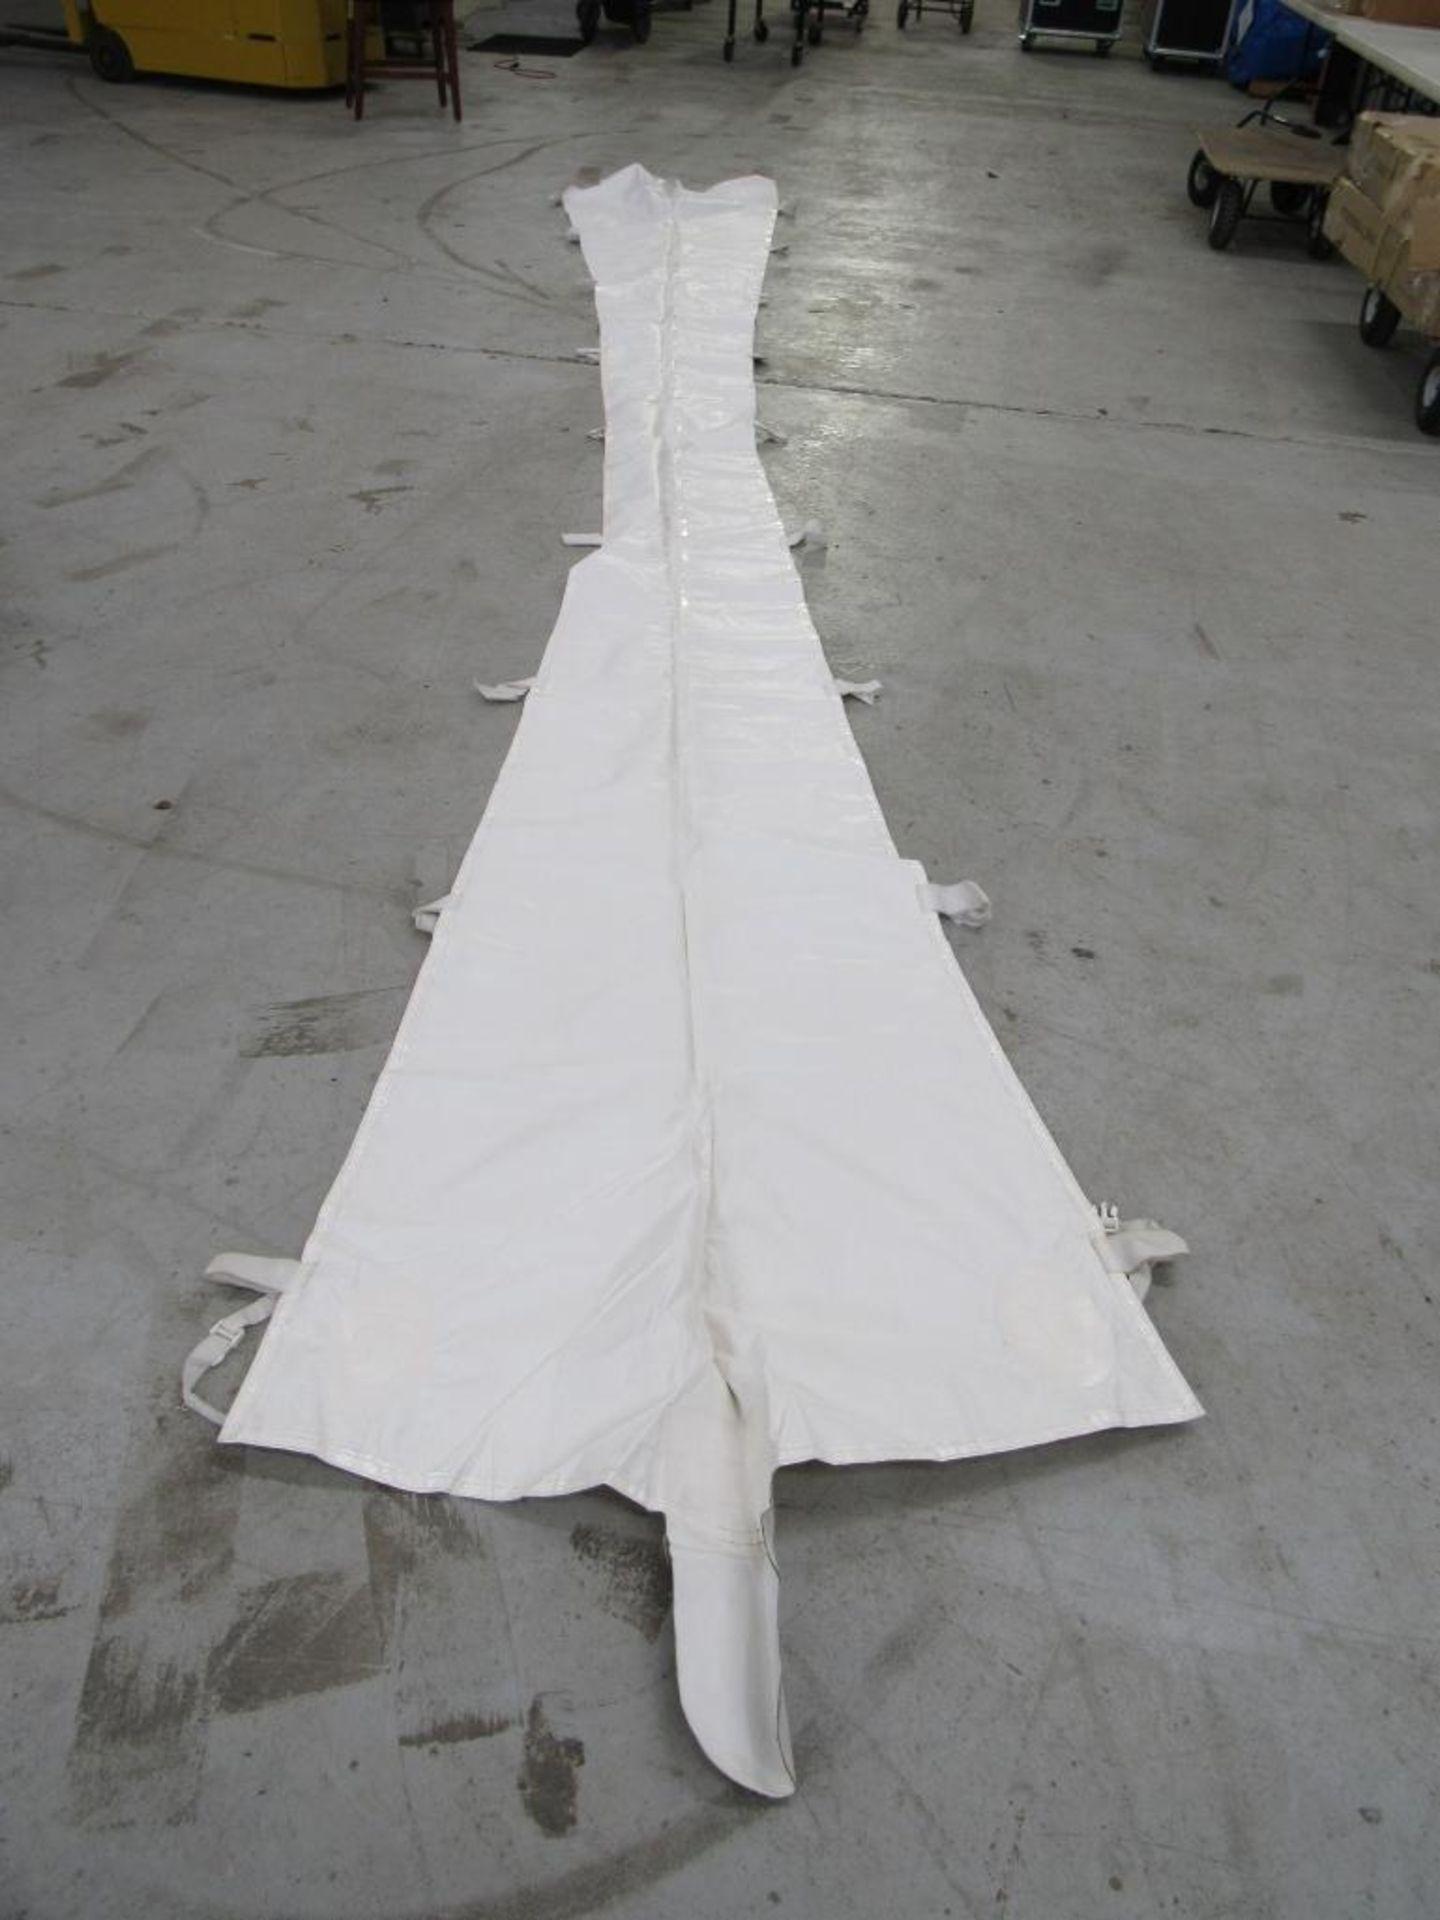 Lot 72 - PINNACLE Rain Gutters, 20 ft. Tent (2) Pieces